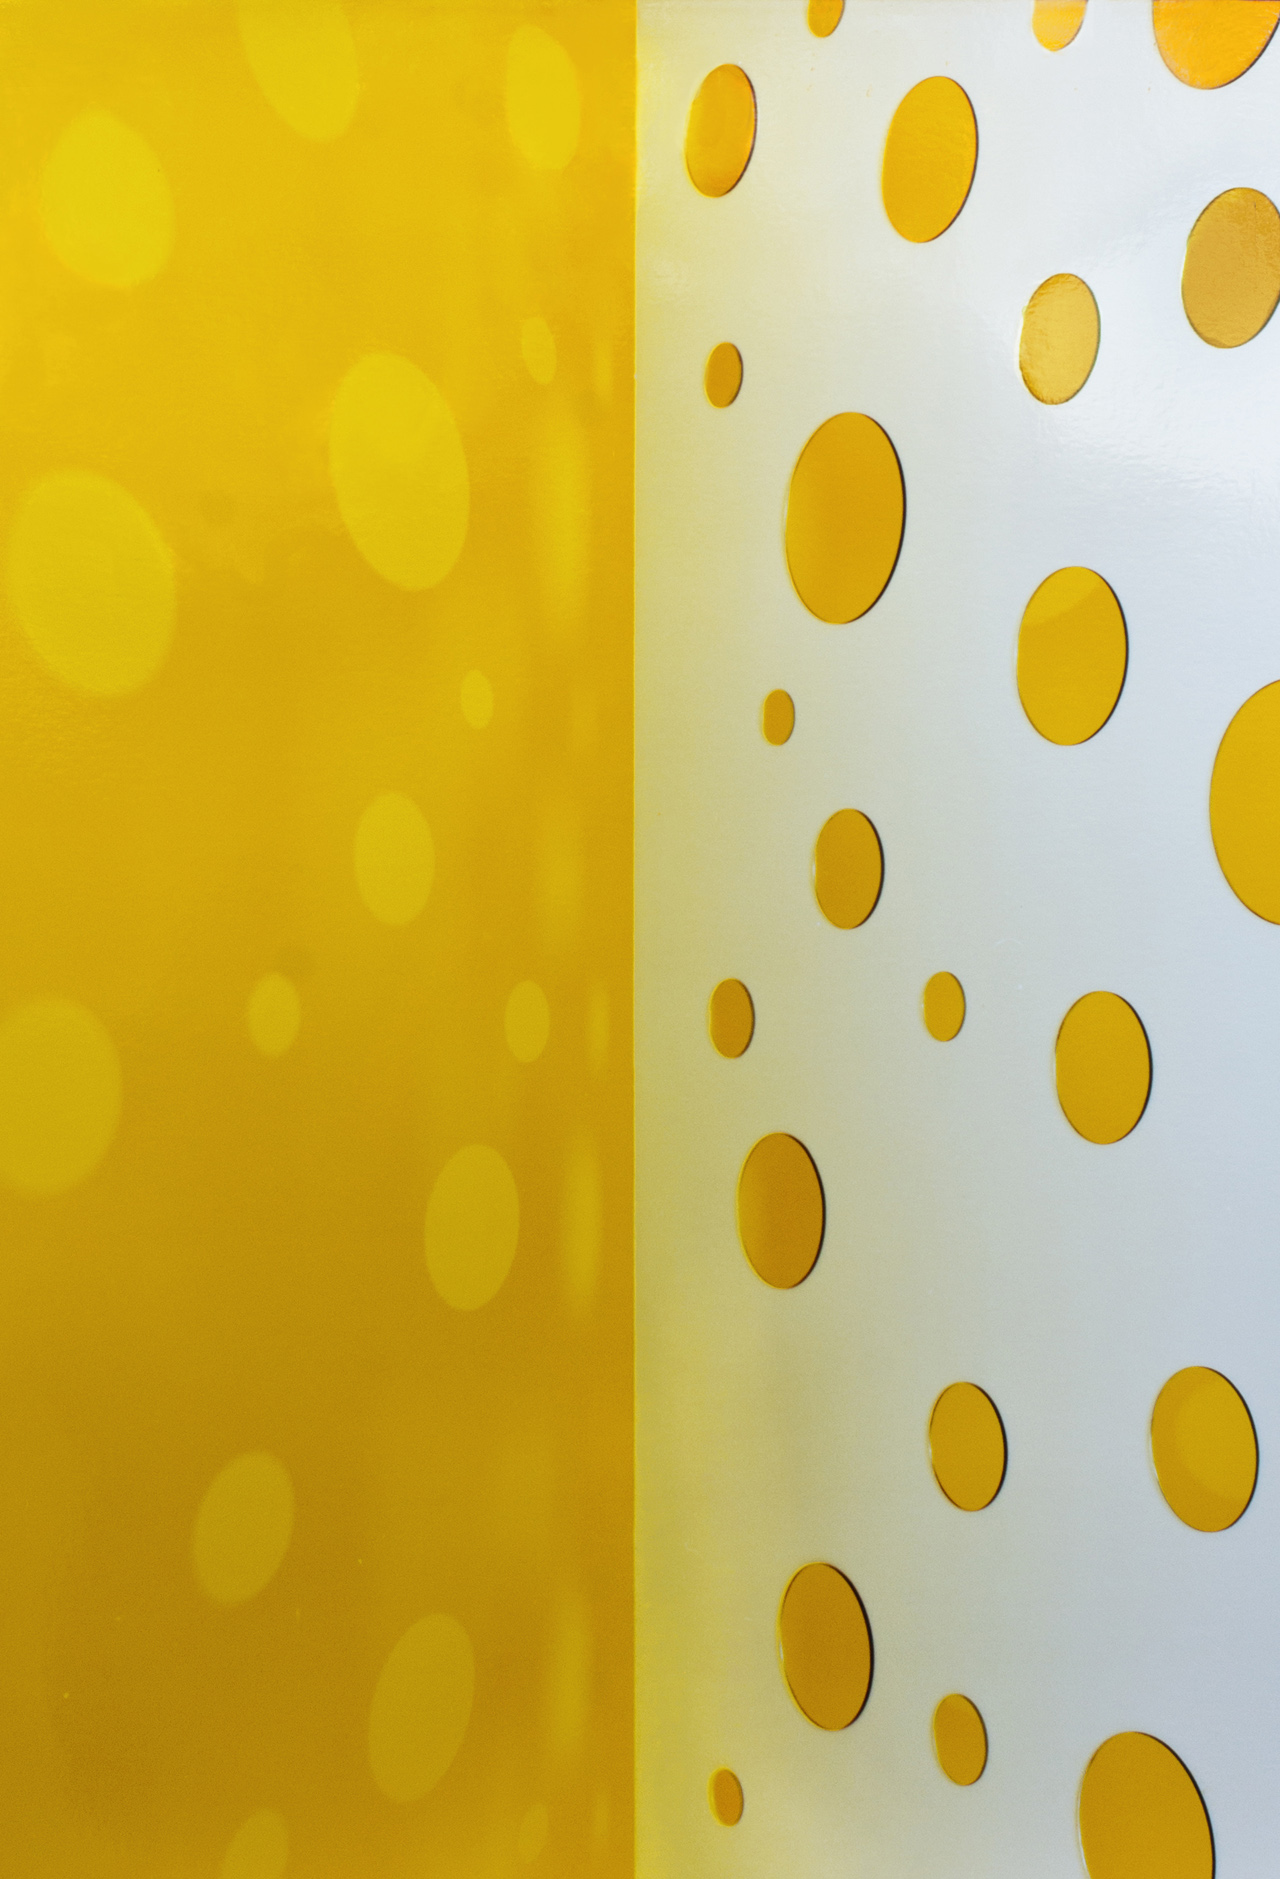 JACKY REDGATE   Light Throw (Mirrors) Fold - Yellow and White  2018 Chromogenic photograph handprinted 185 x 127 cm